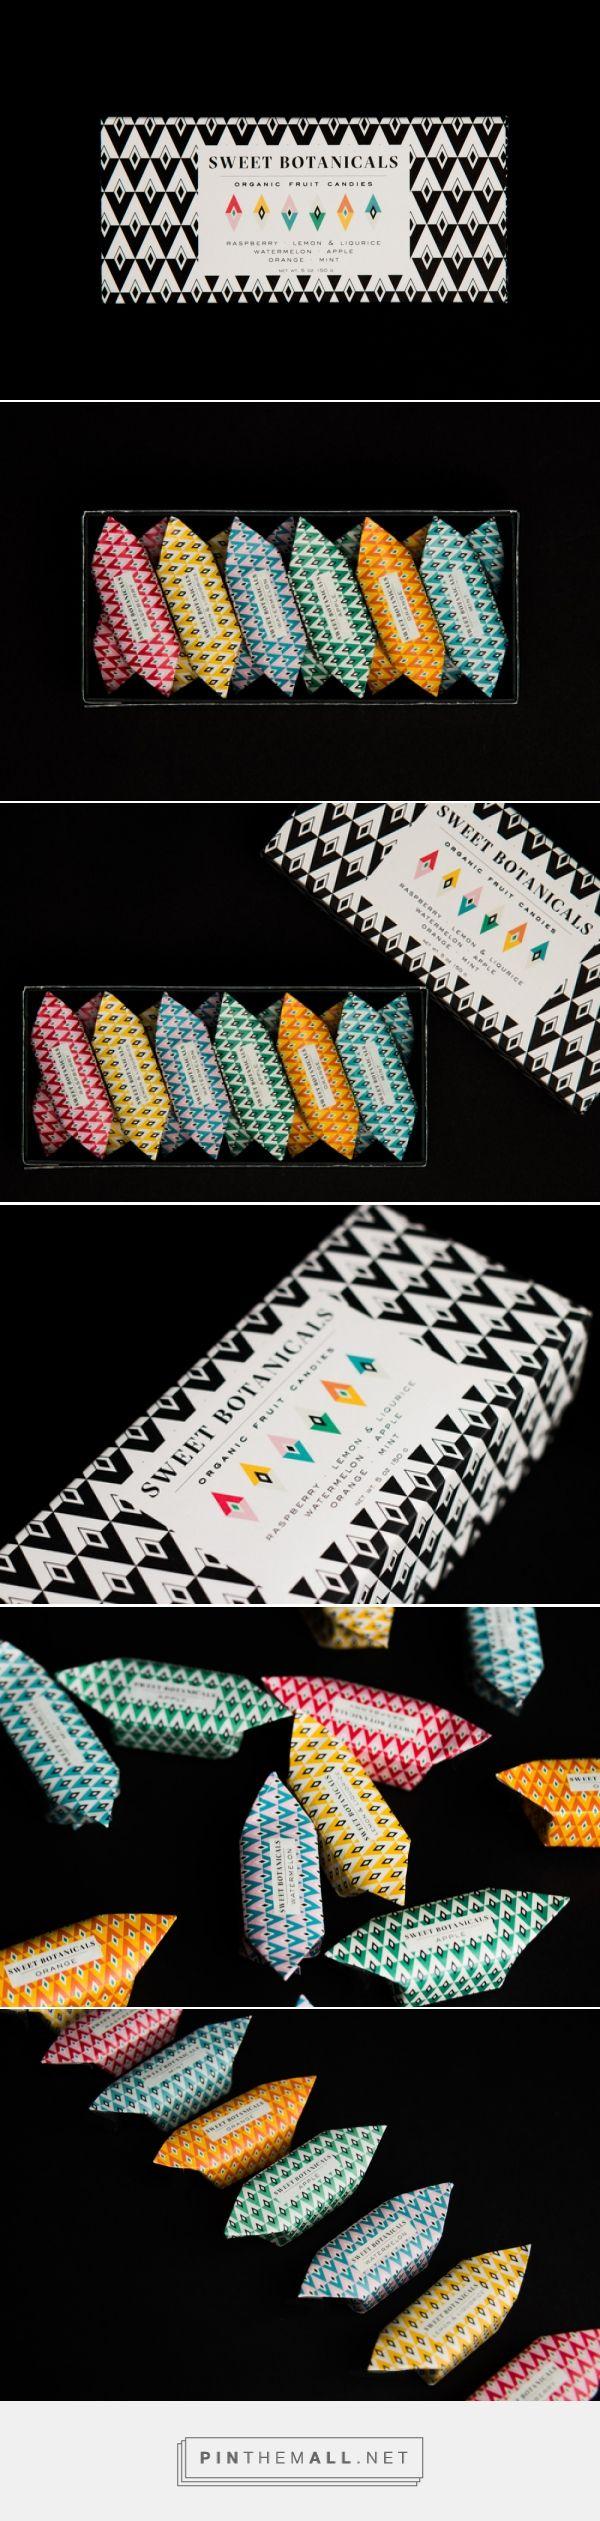 SWEET BOTANICALS / organic candy brand Sweet Botanicals by Anna Ahnborg